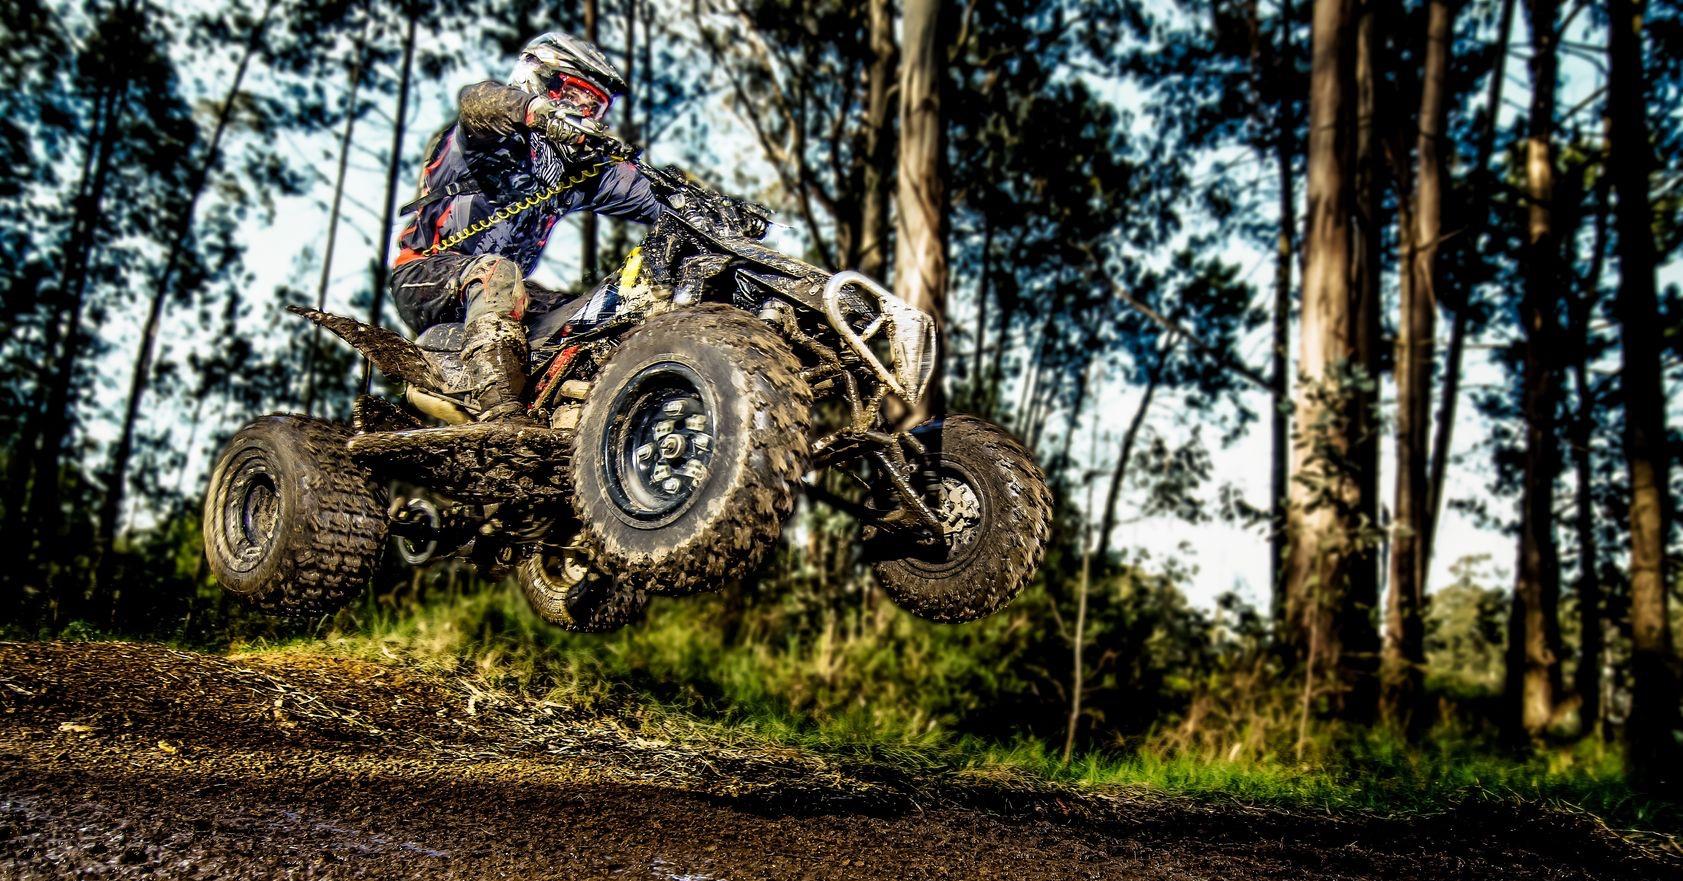 ATV Trail Riders using the RokPak Pioneer Series